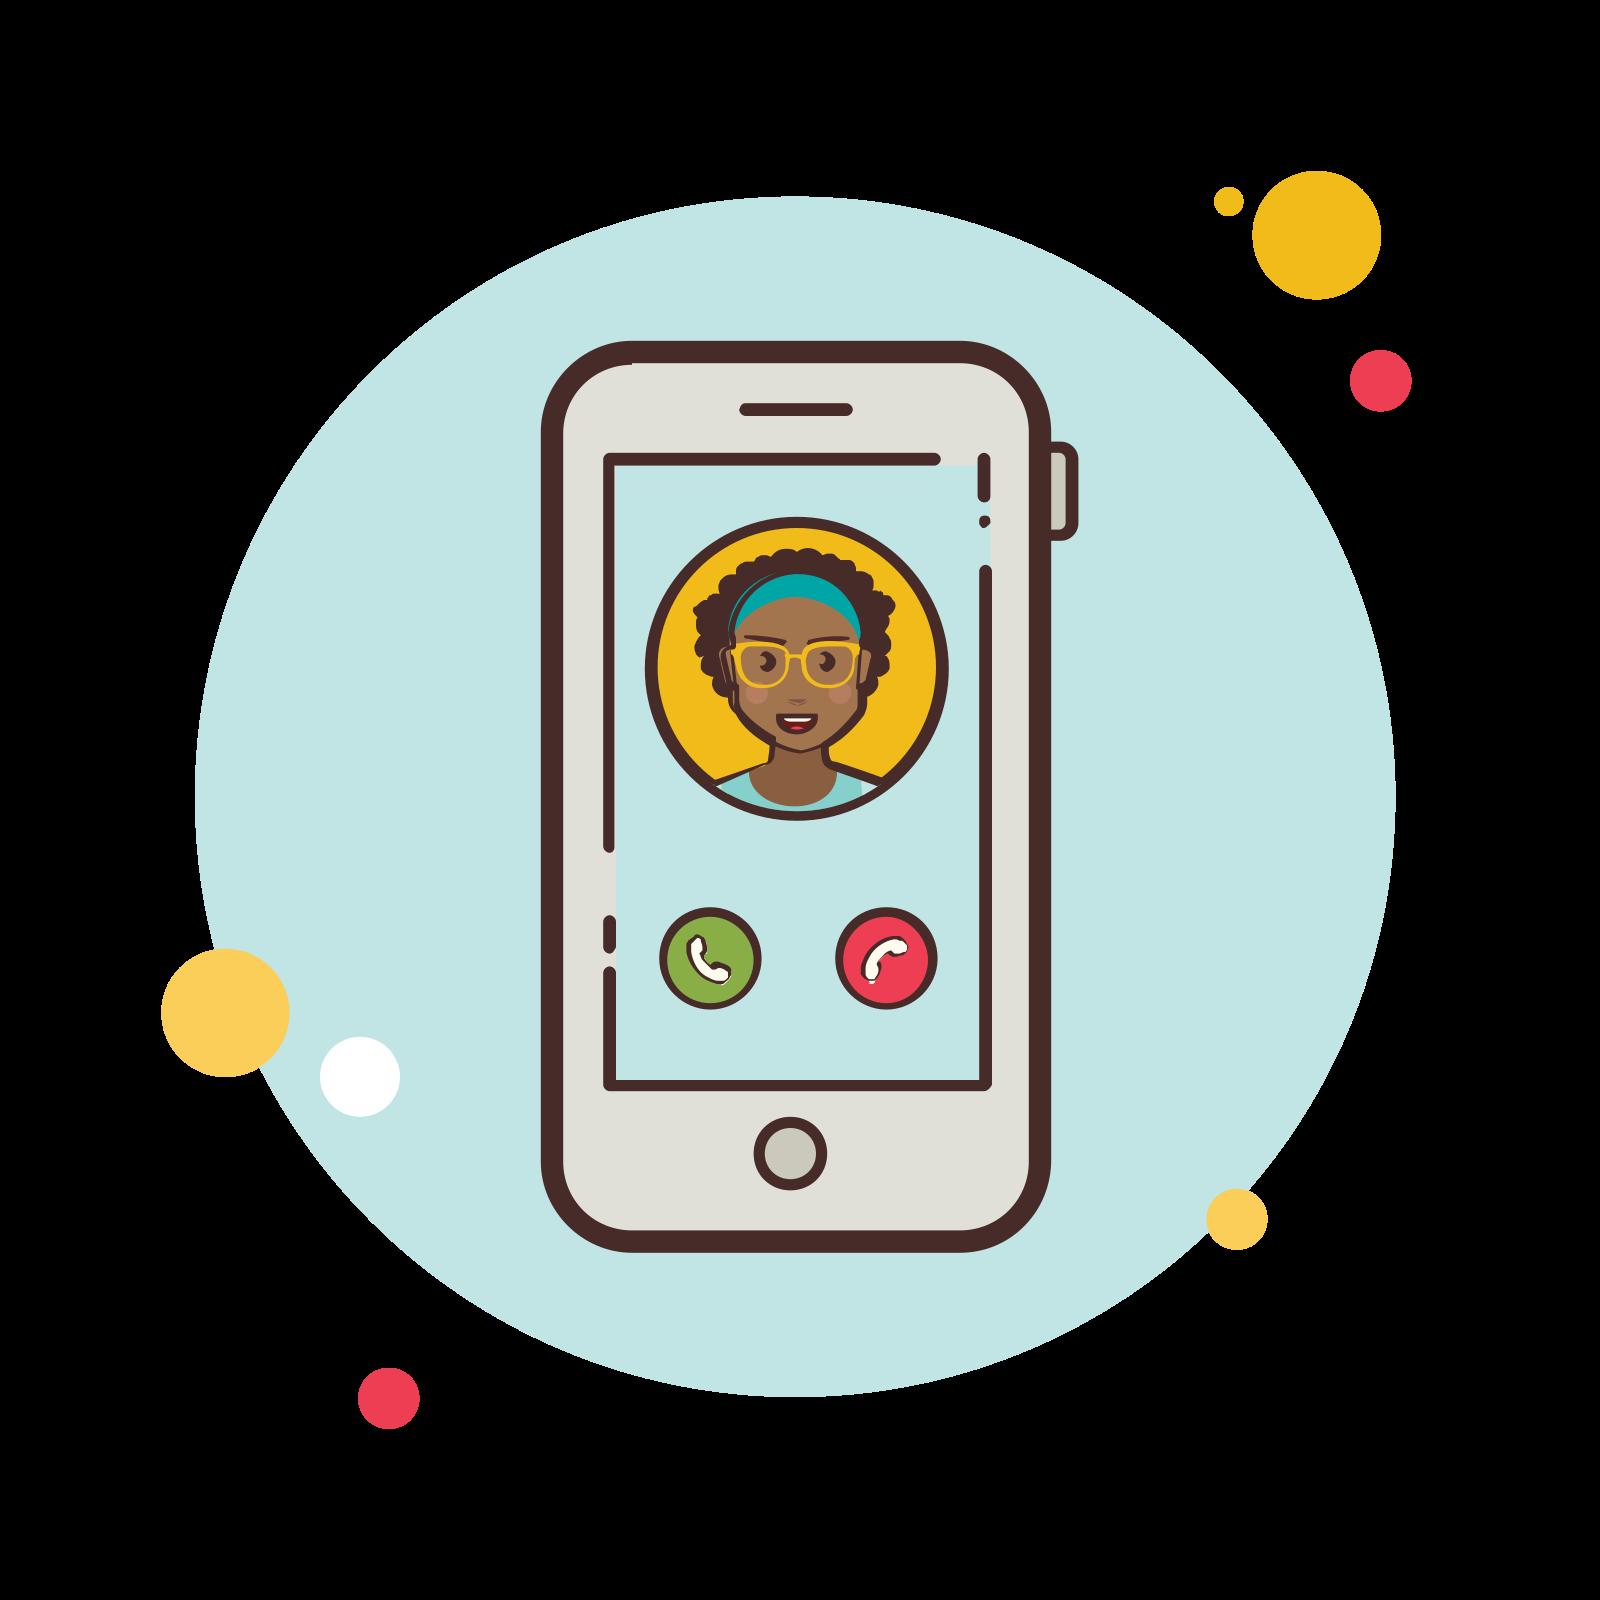 Teacher Phone Call icon